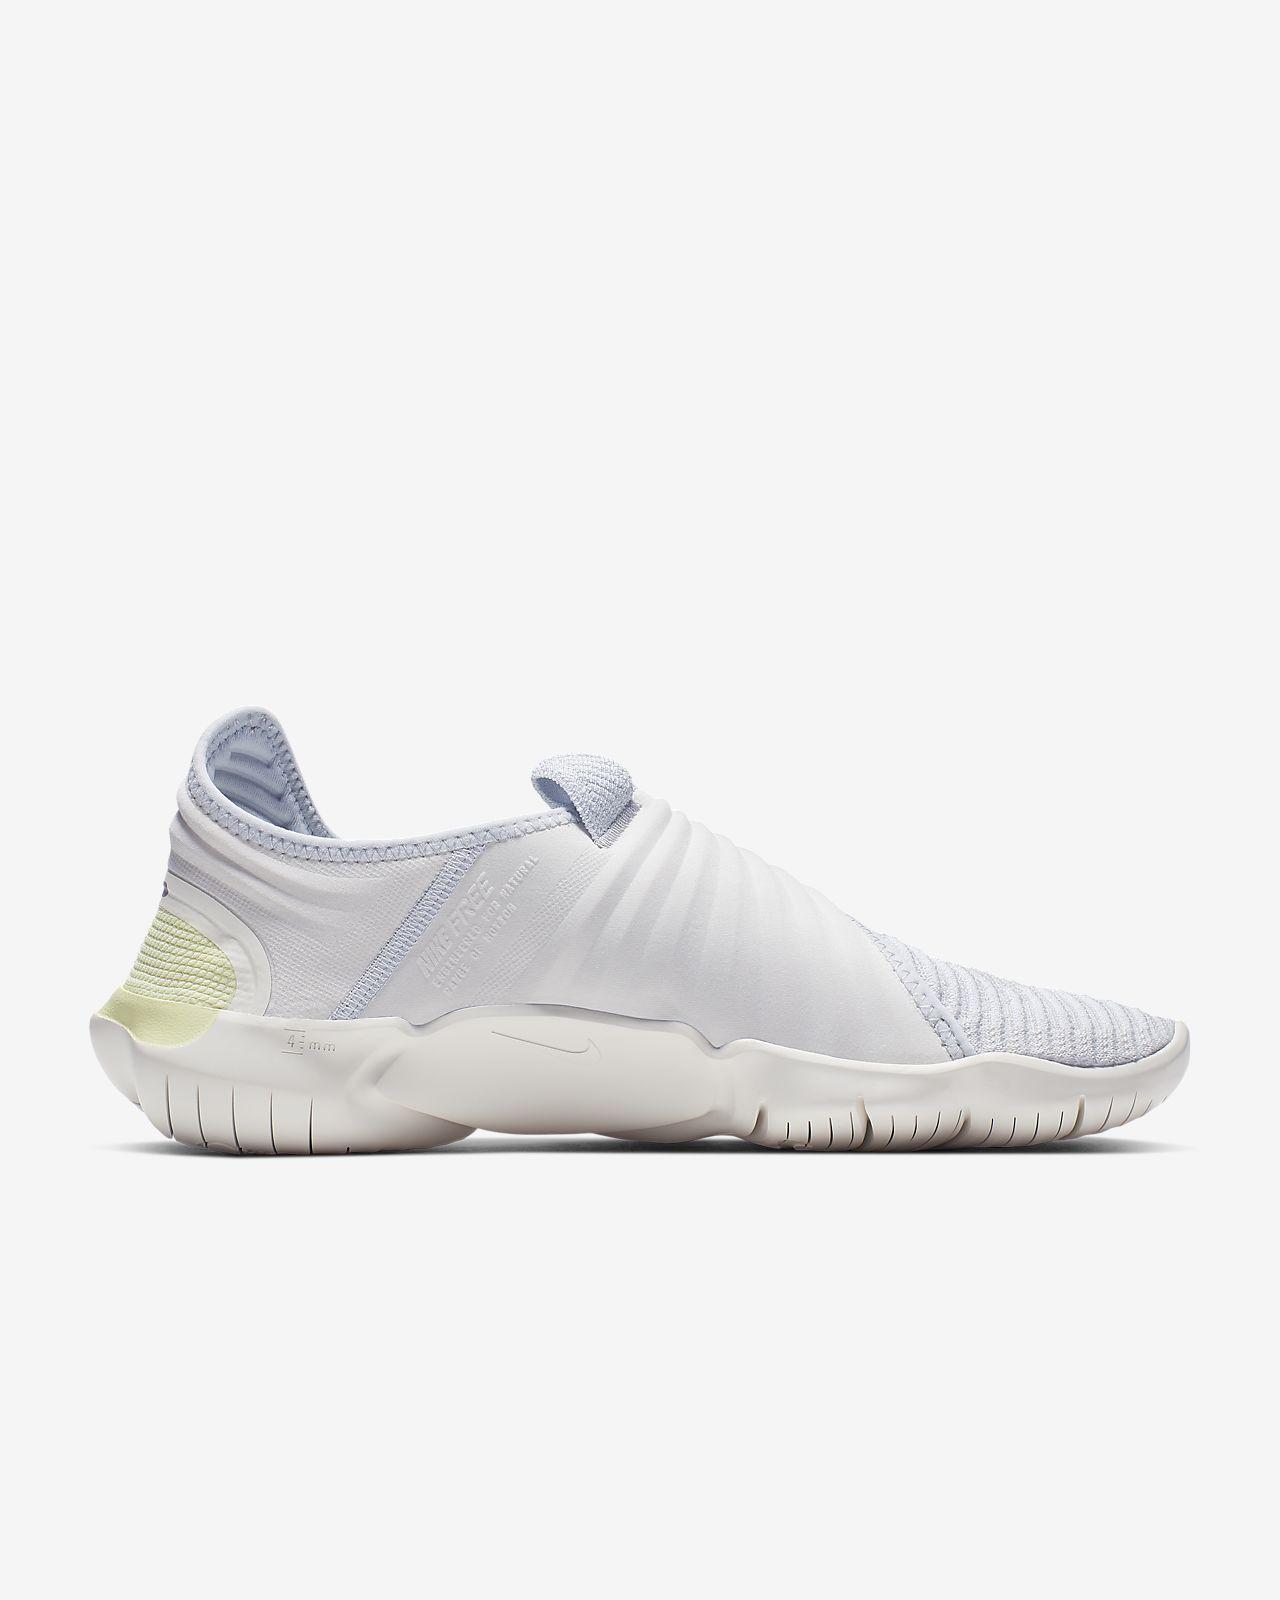 0490ad64ca02c Nike Free RN Flyknit 3.0 Men s Running Shoe. Nike.com AU